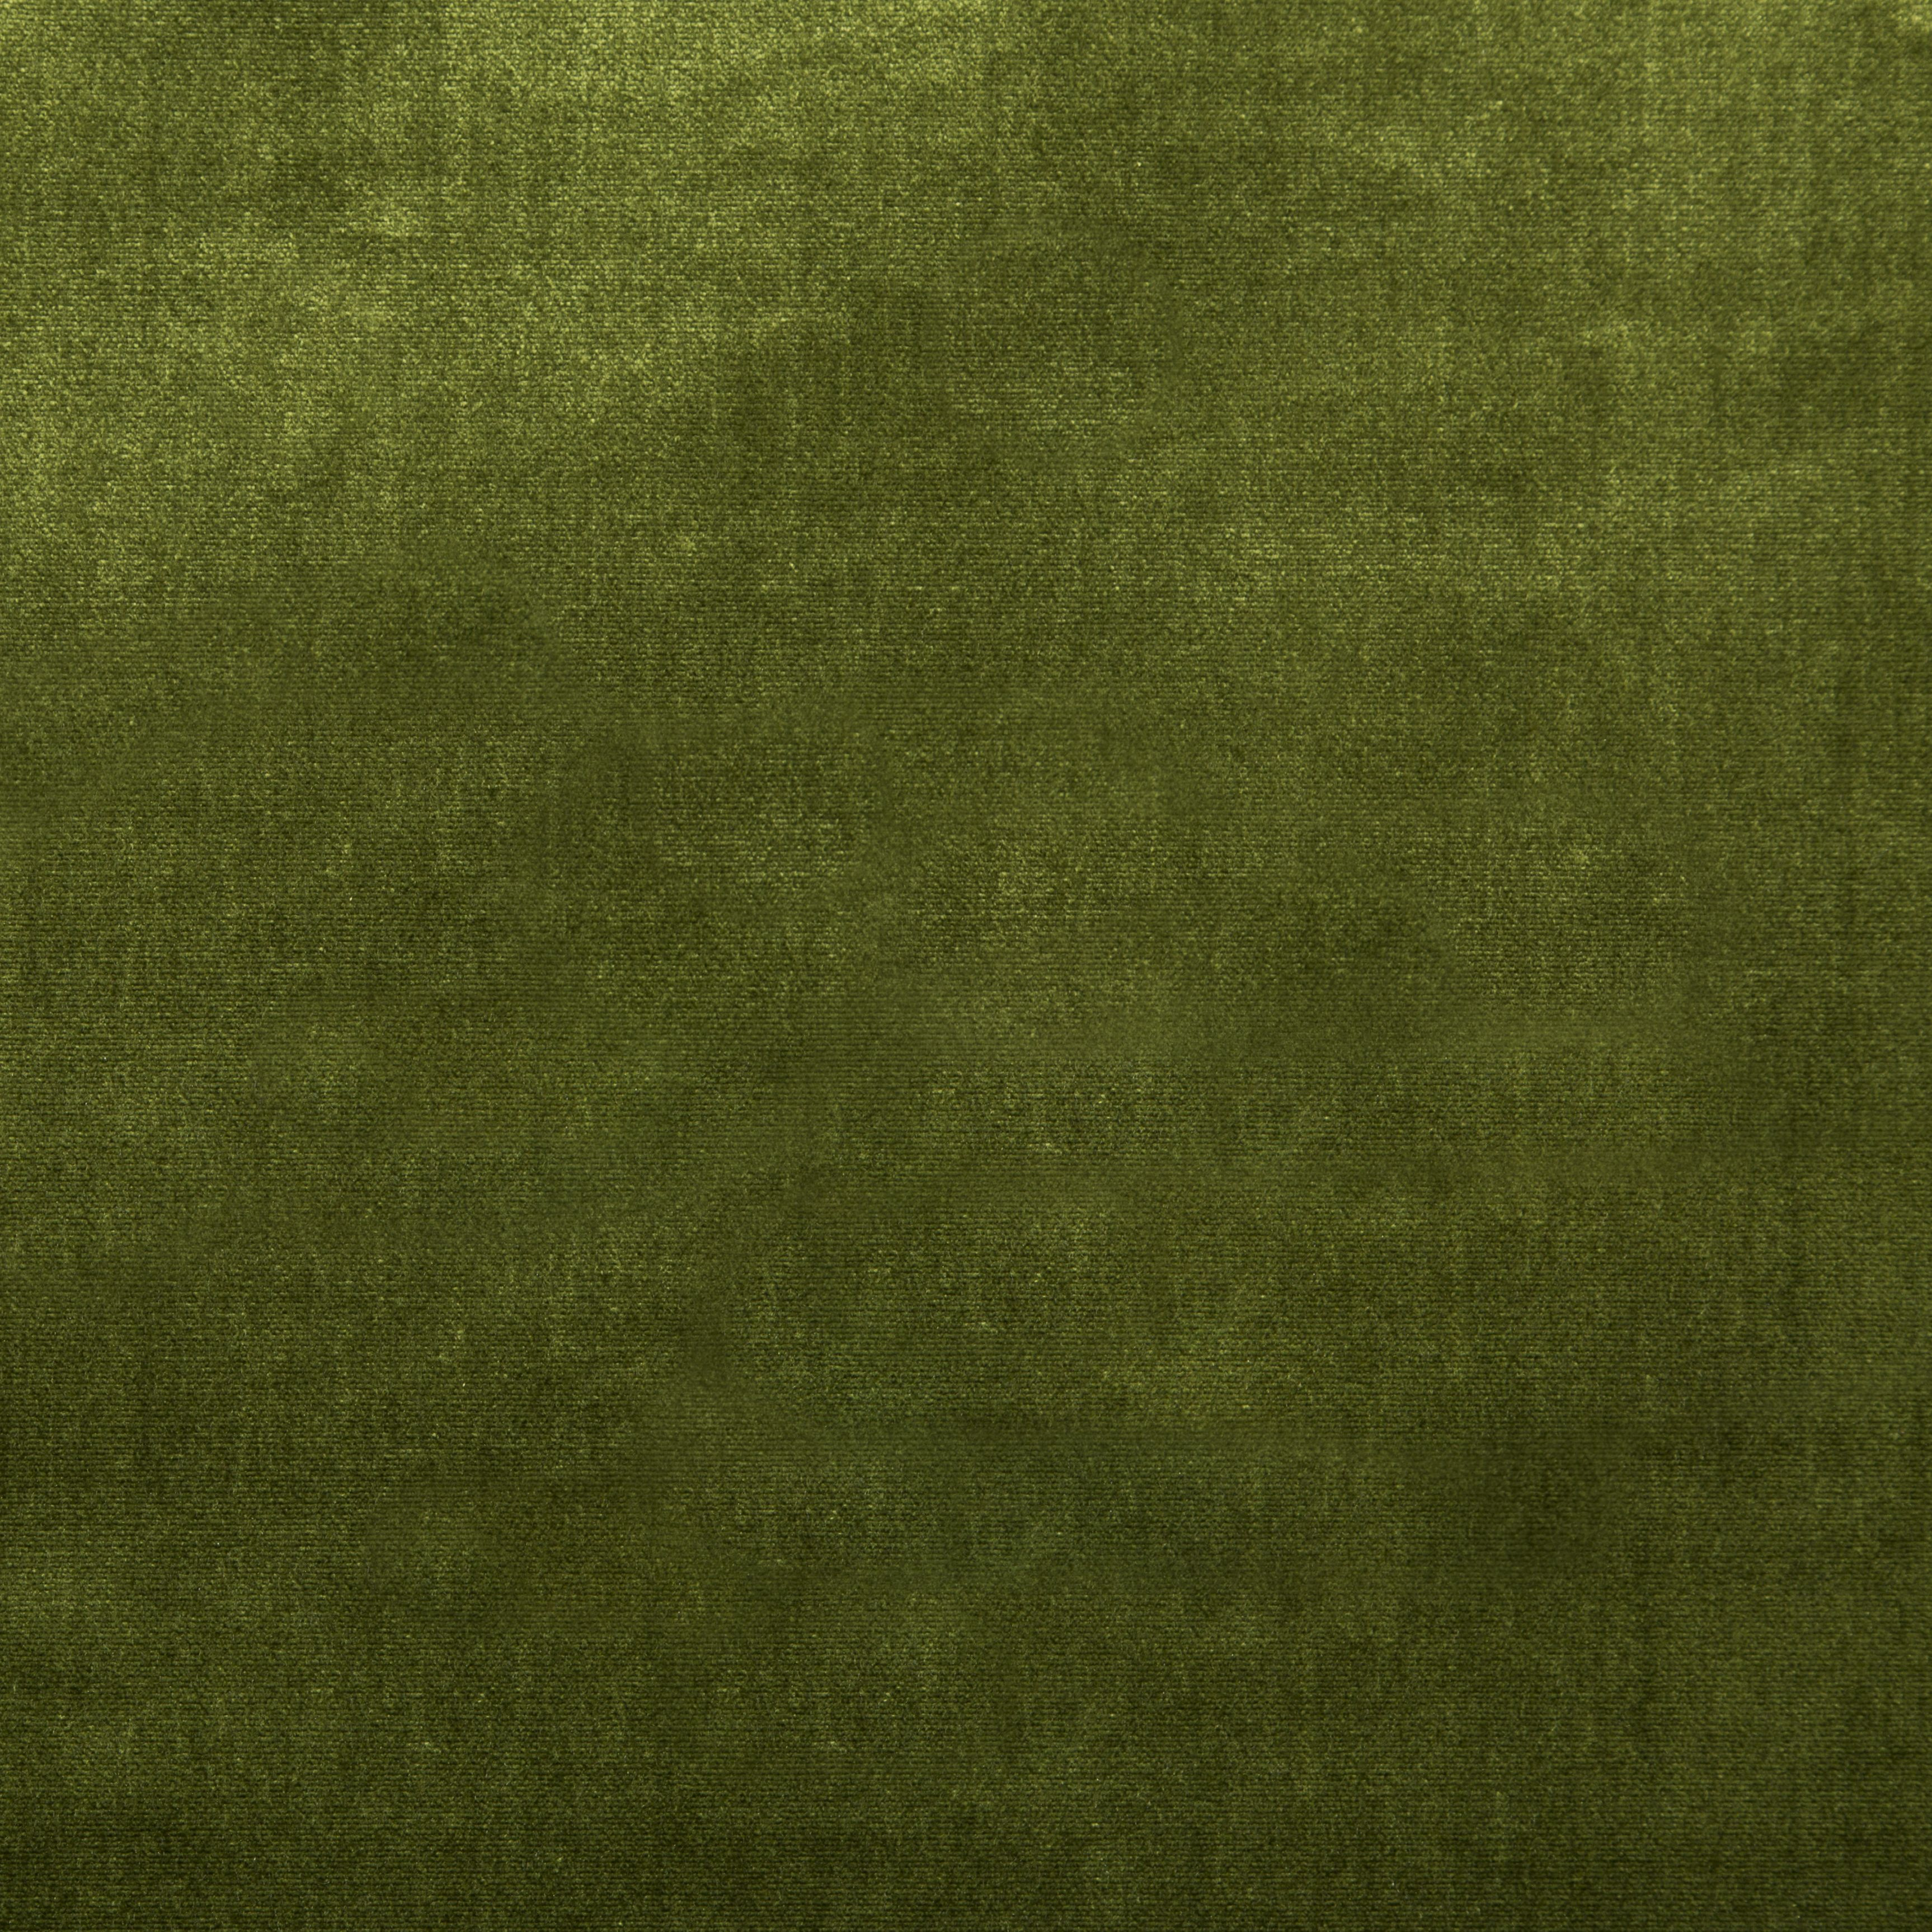 Sofa Leather And Fabric